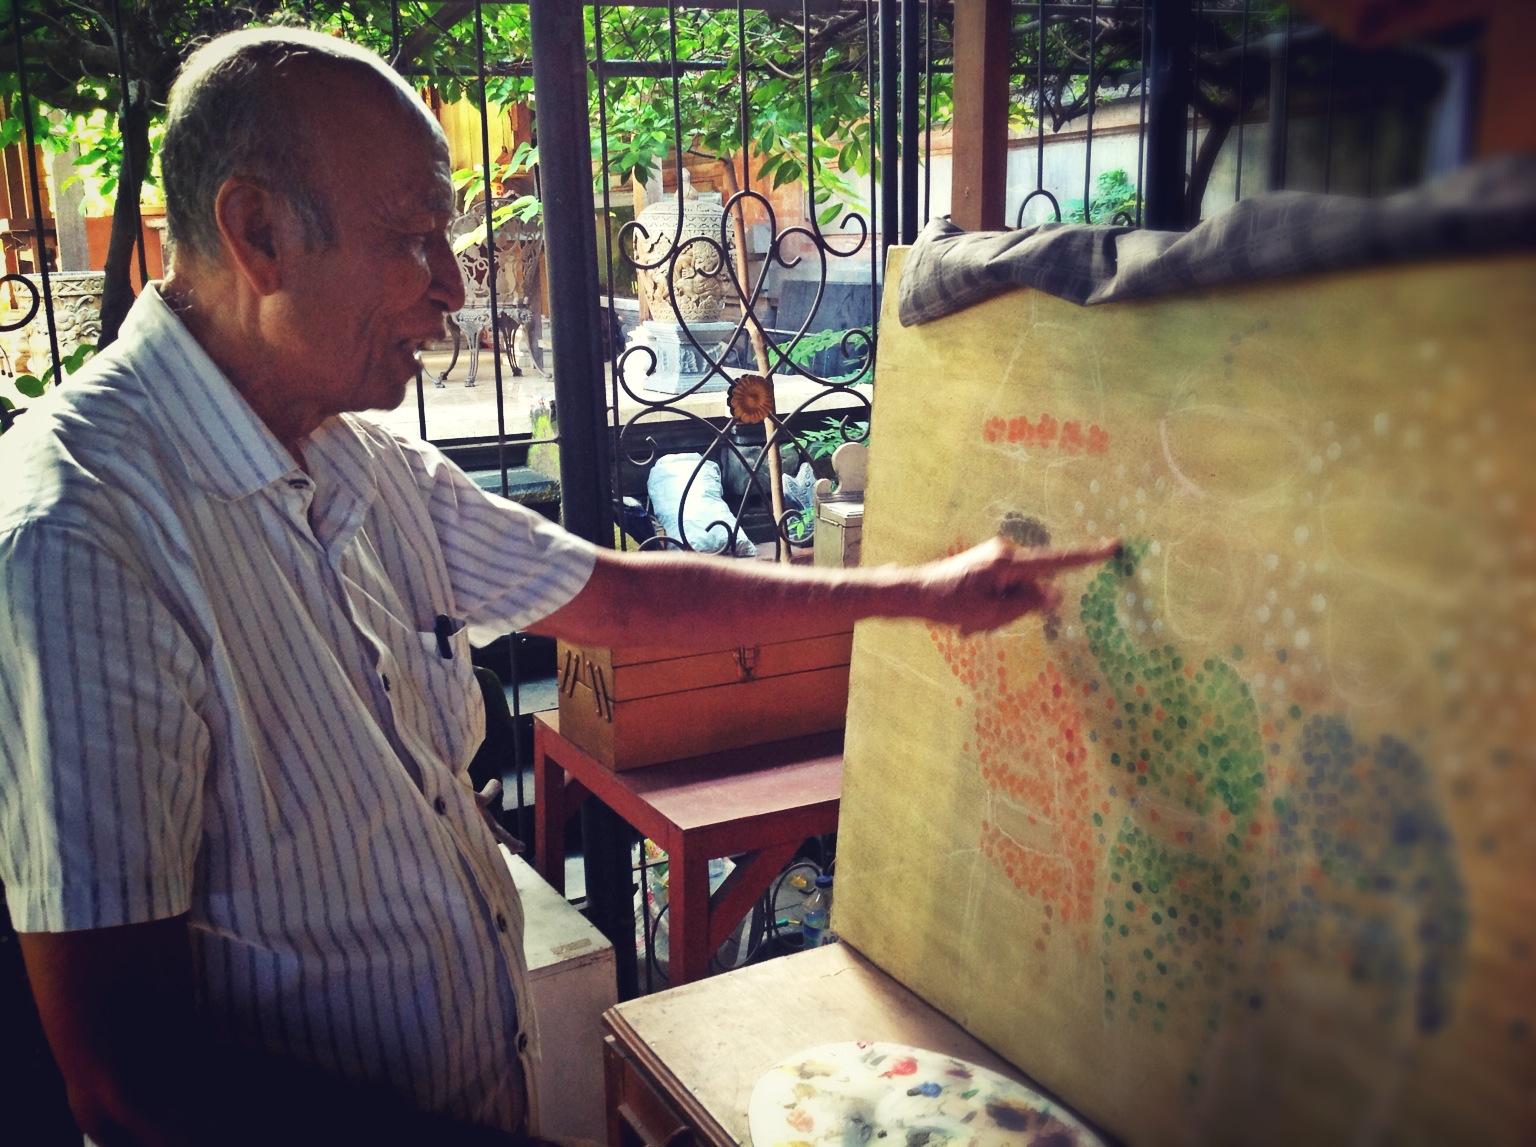 Enjoying Unique Art Fingerprint Lukisan Sidik Jari Museum Img 1015